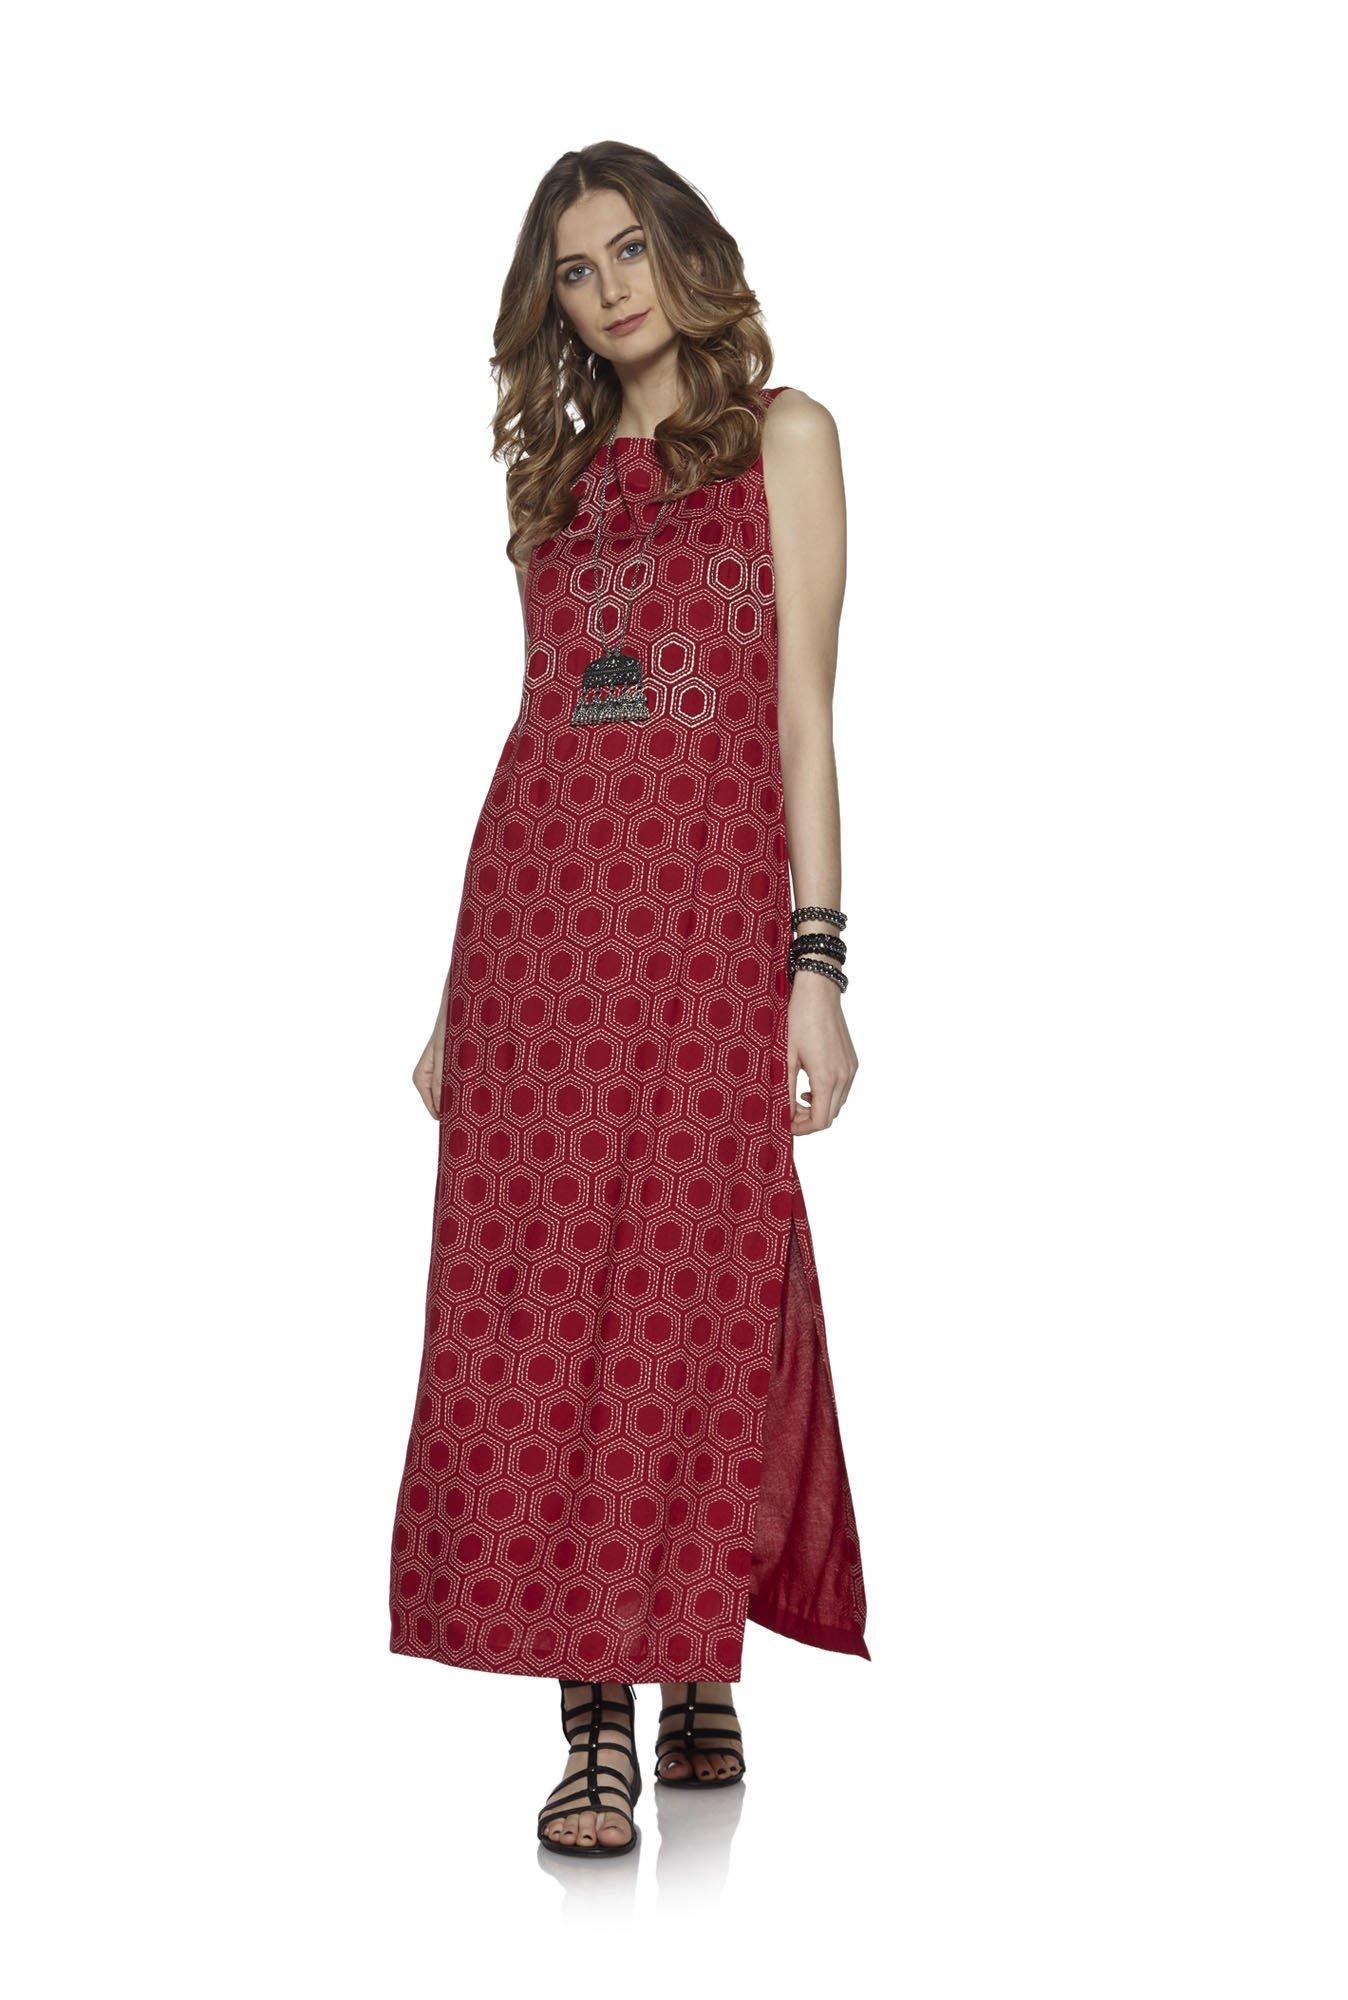 645142577b Where To Buy Maxi Dresses In Mumbai – DACC